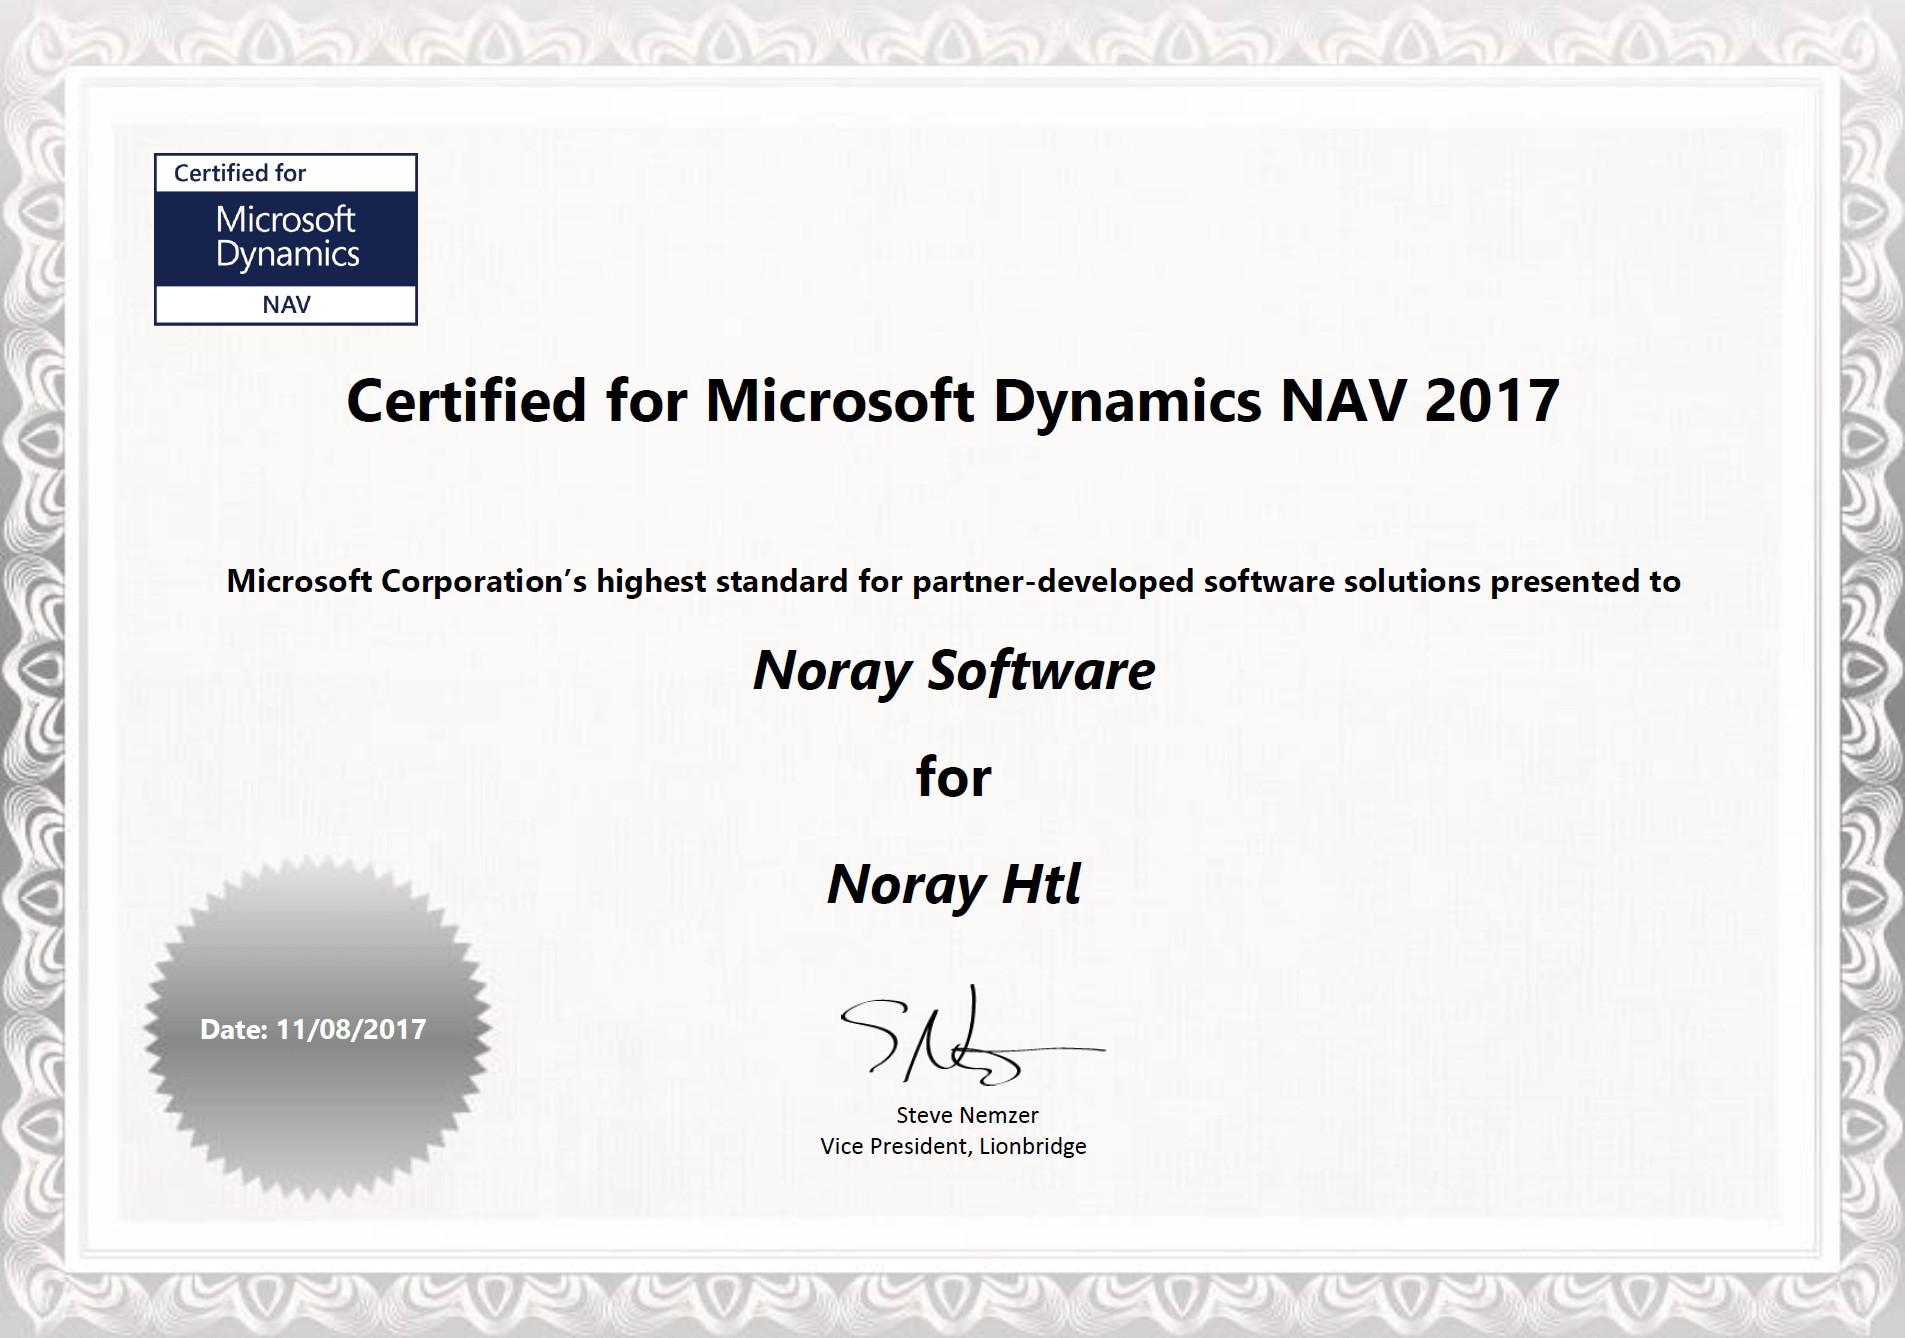 noray obtiene cfmd de microsoft dynamics nav 2017